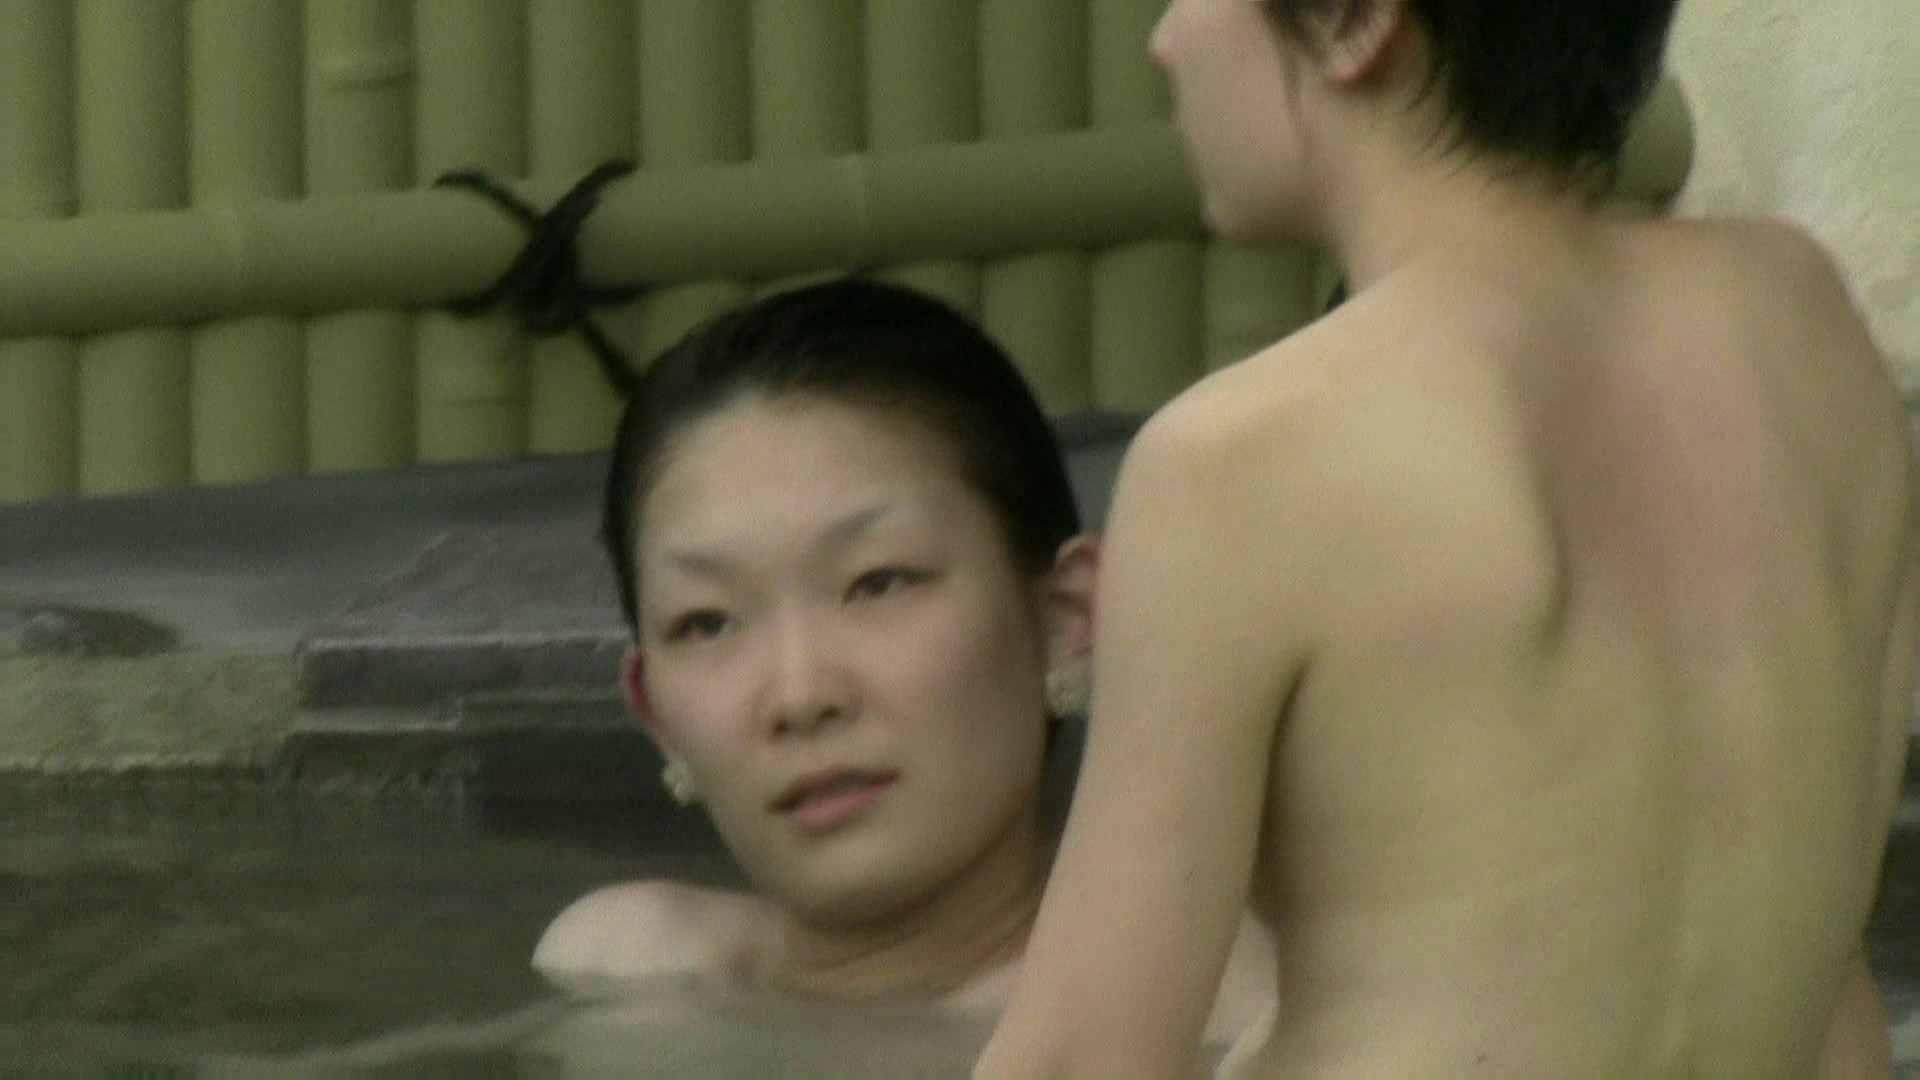 Aquaな露天風呂Vol.670 0  81連発 70